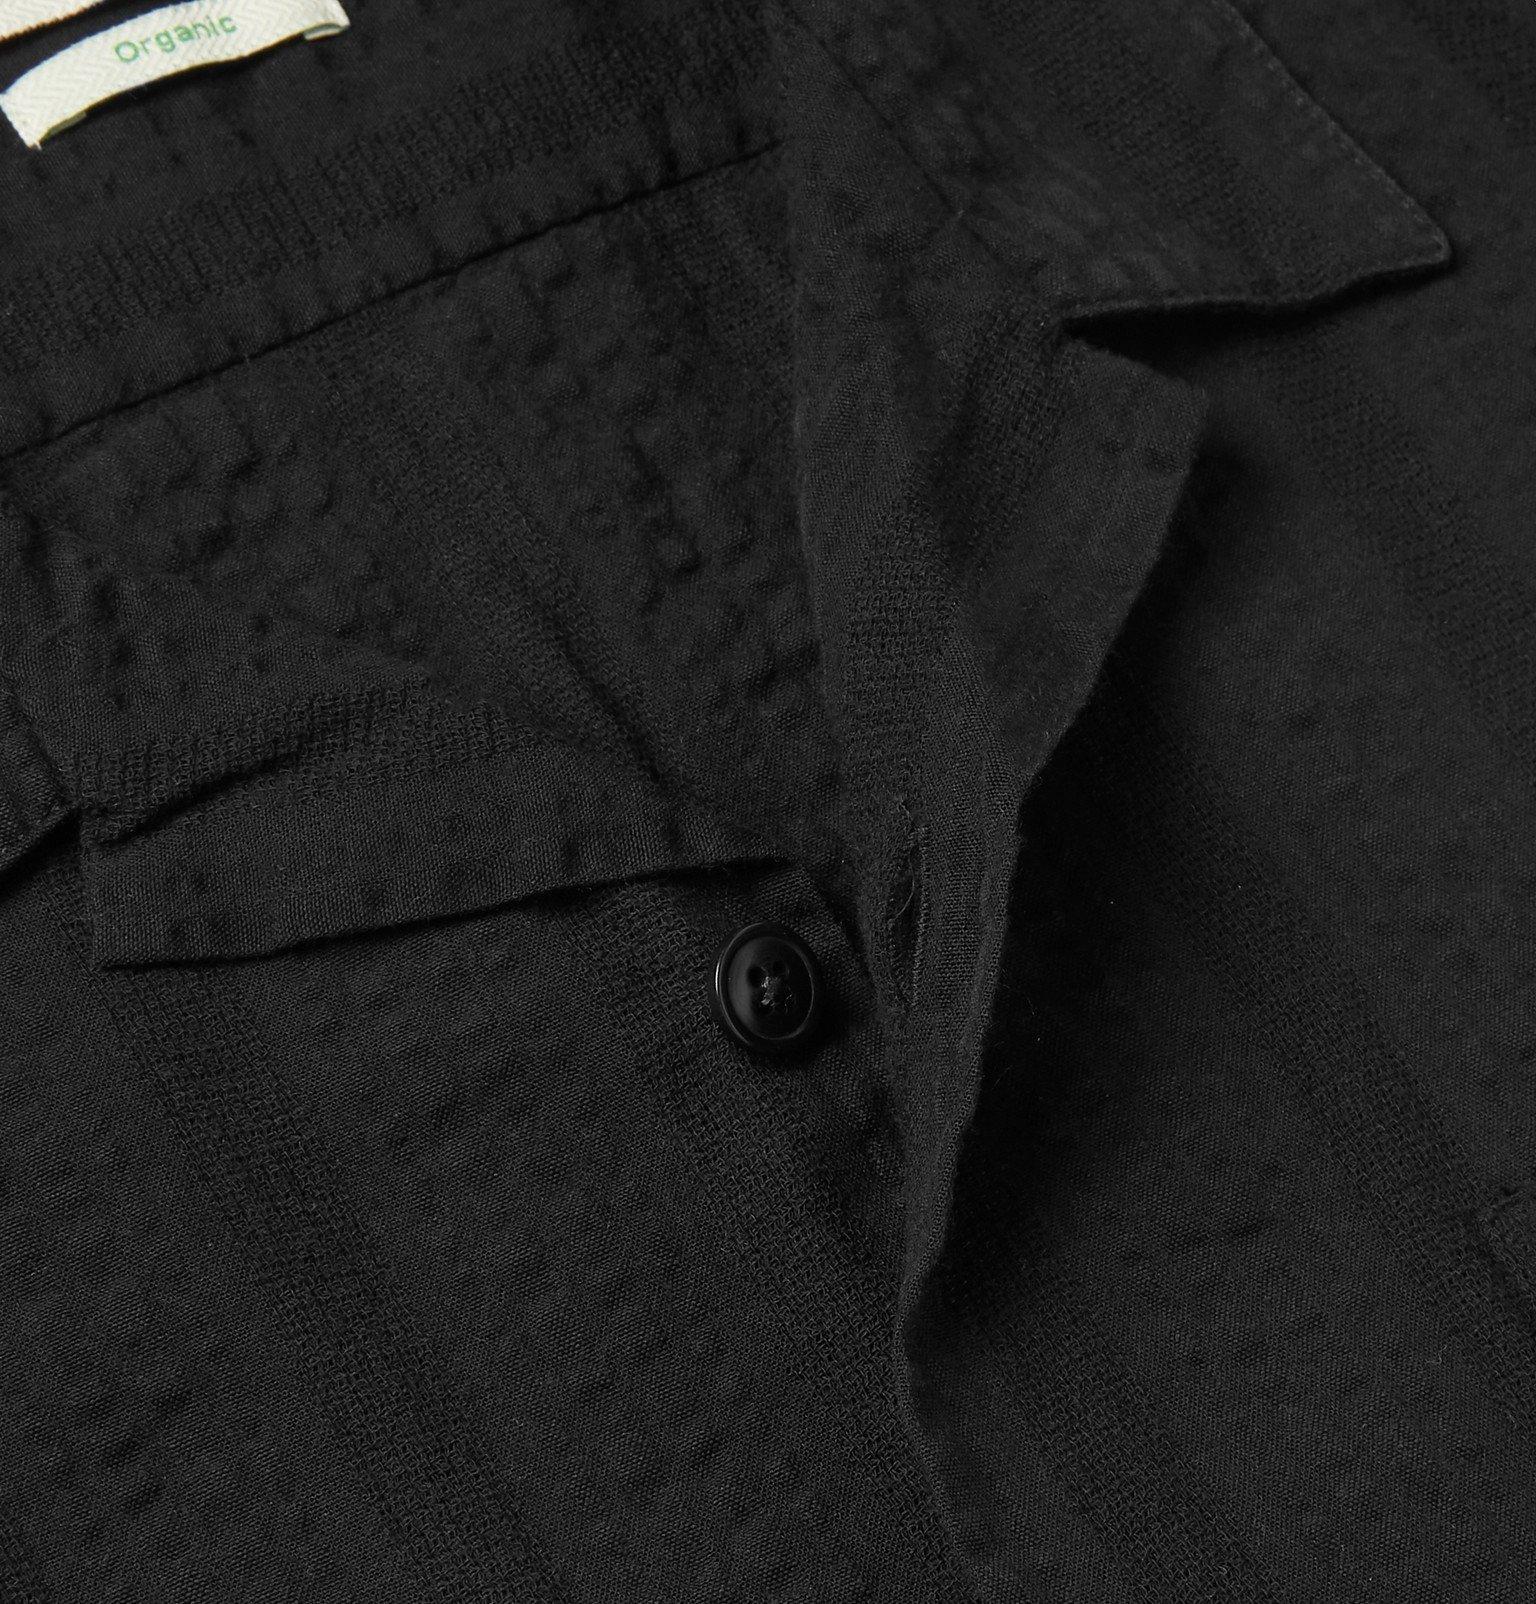 Oliver Spencer - Slim-Fit Camp-Collar Striped Organic Cotton-Seersucker Shirt - Black